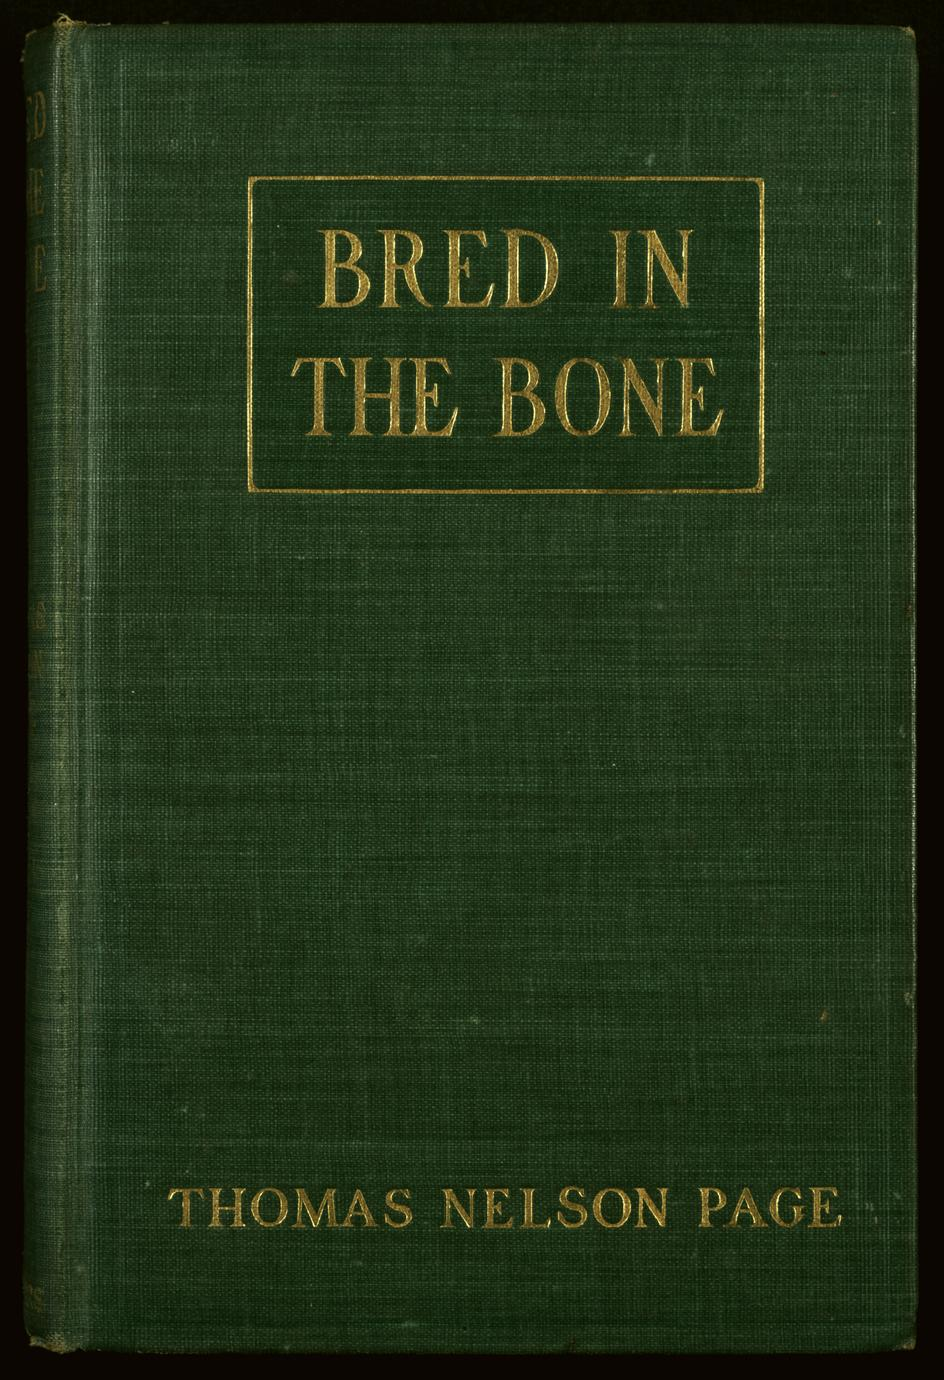 Bred in the bone (1 of 2)